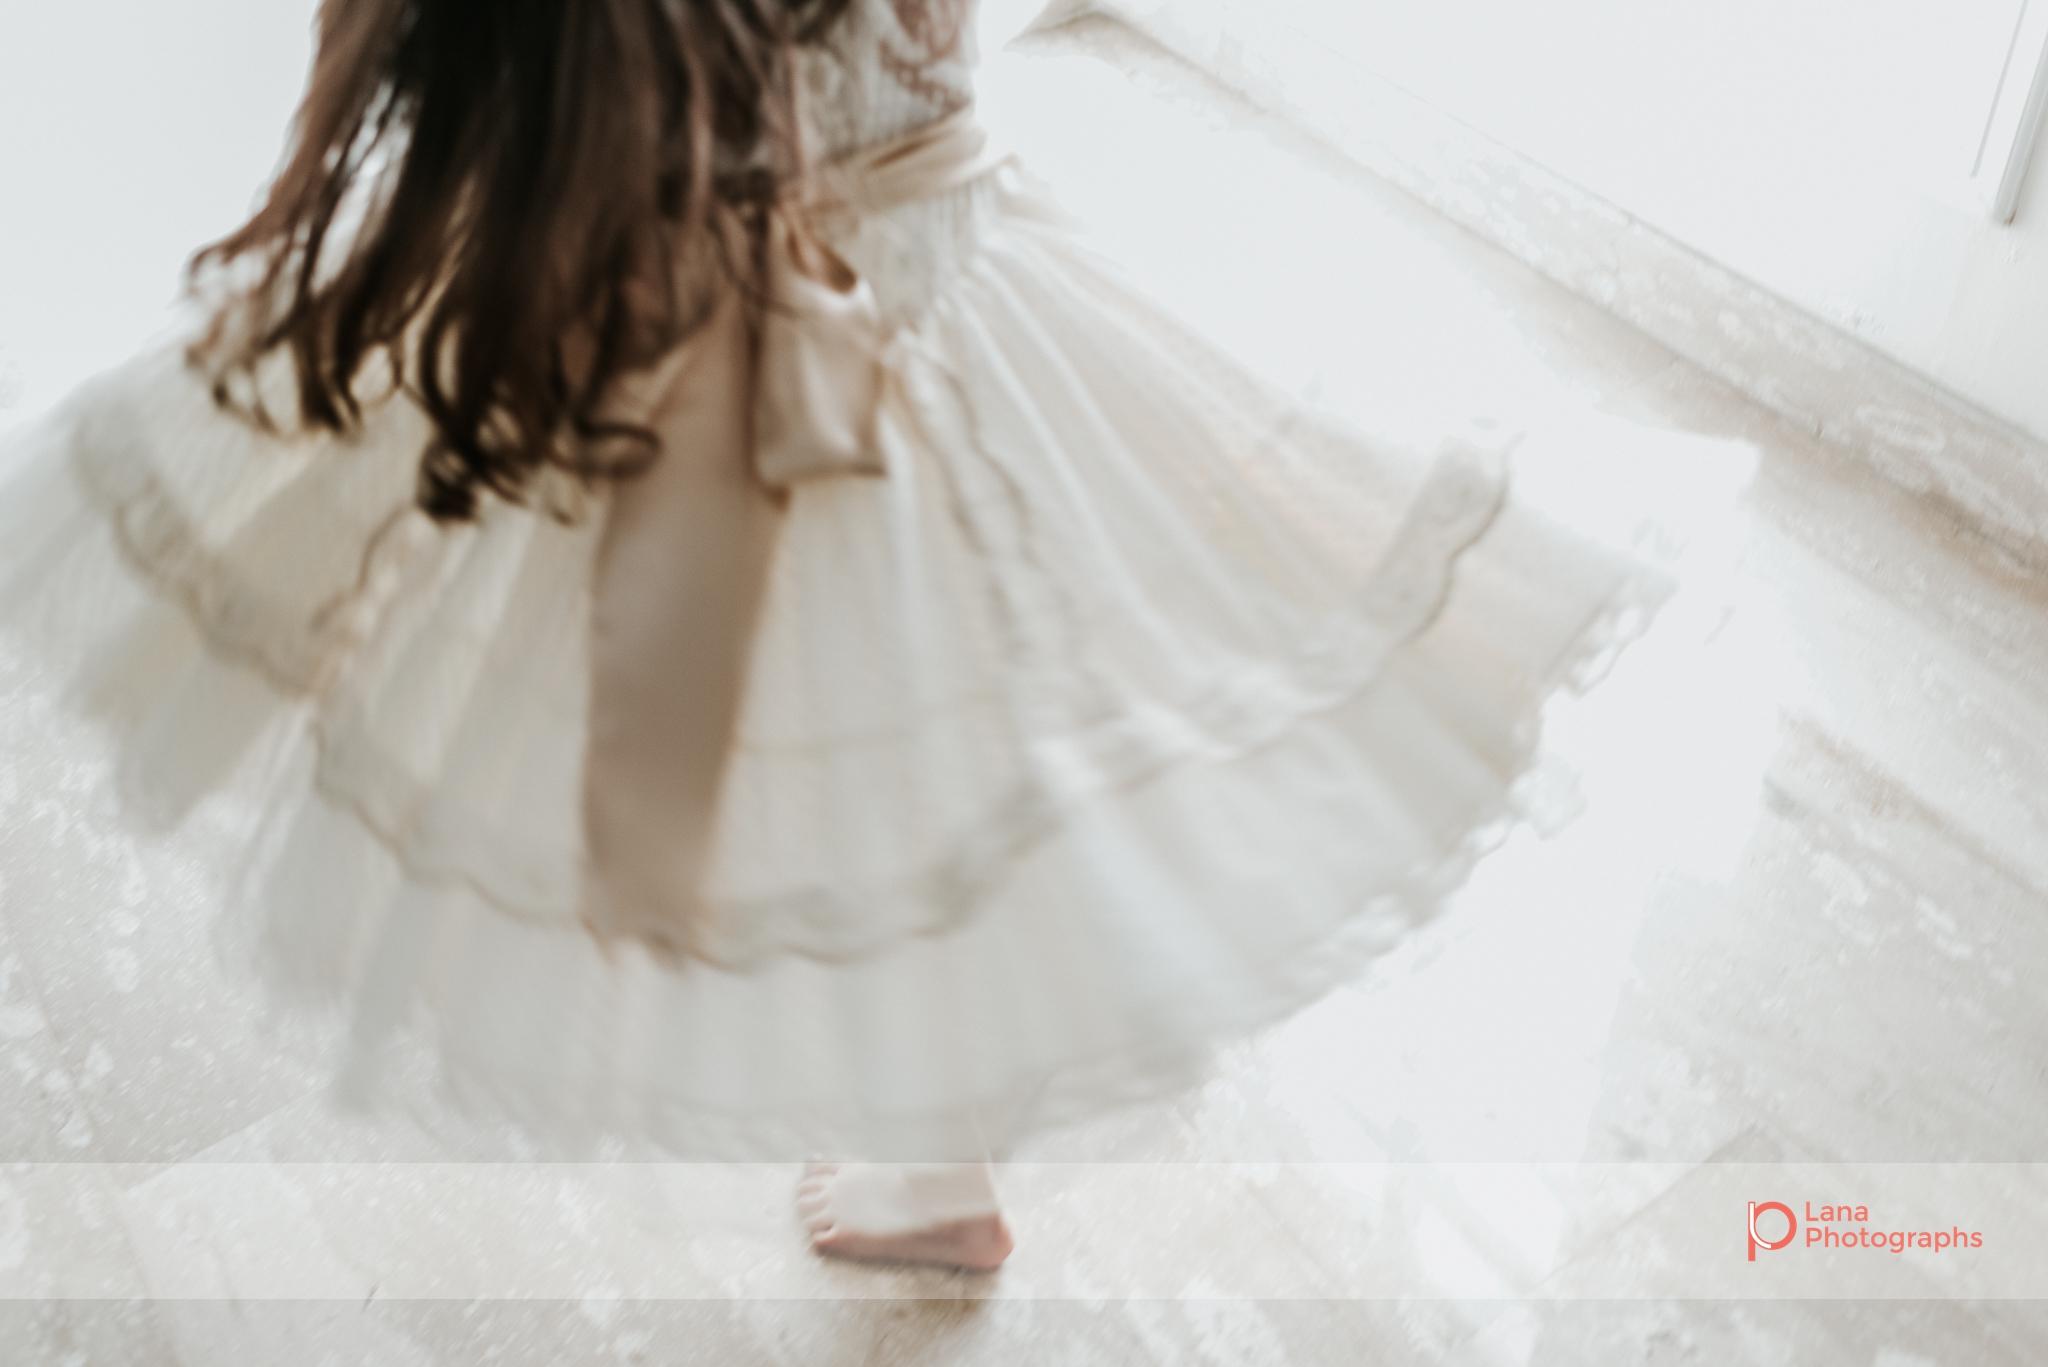 Lana Photographs Family Photographer Dubai Top Family Photographers portrait of little girl twirling